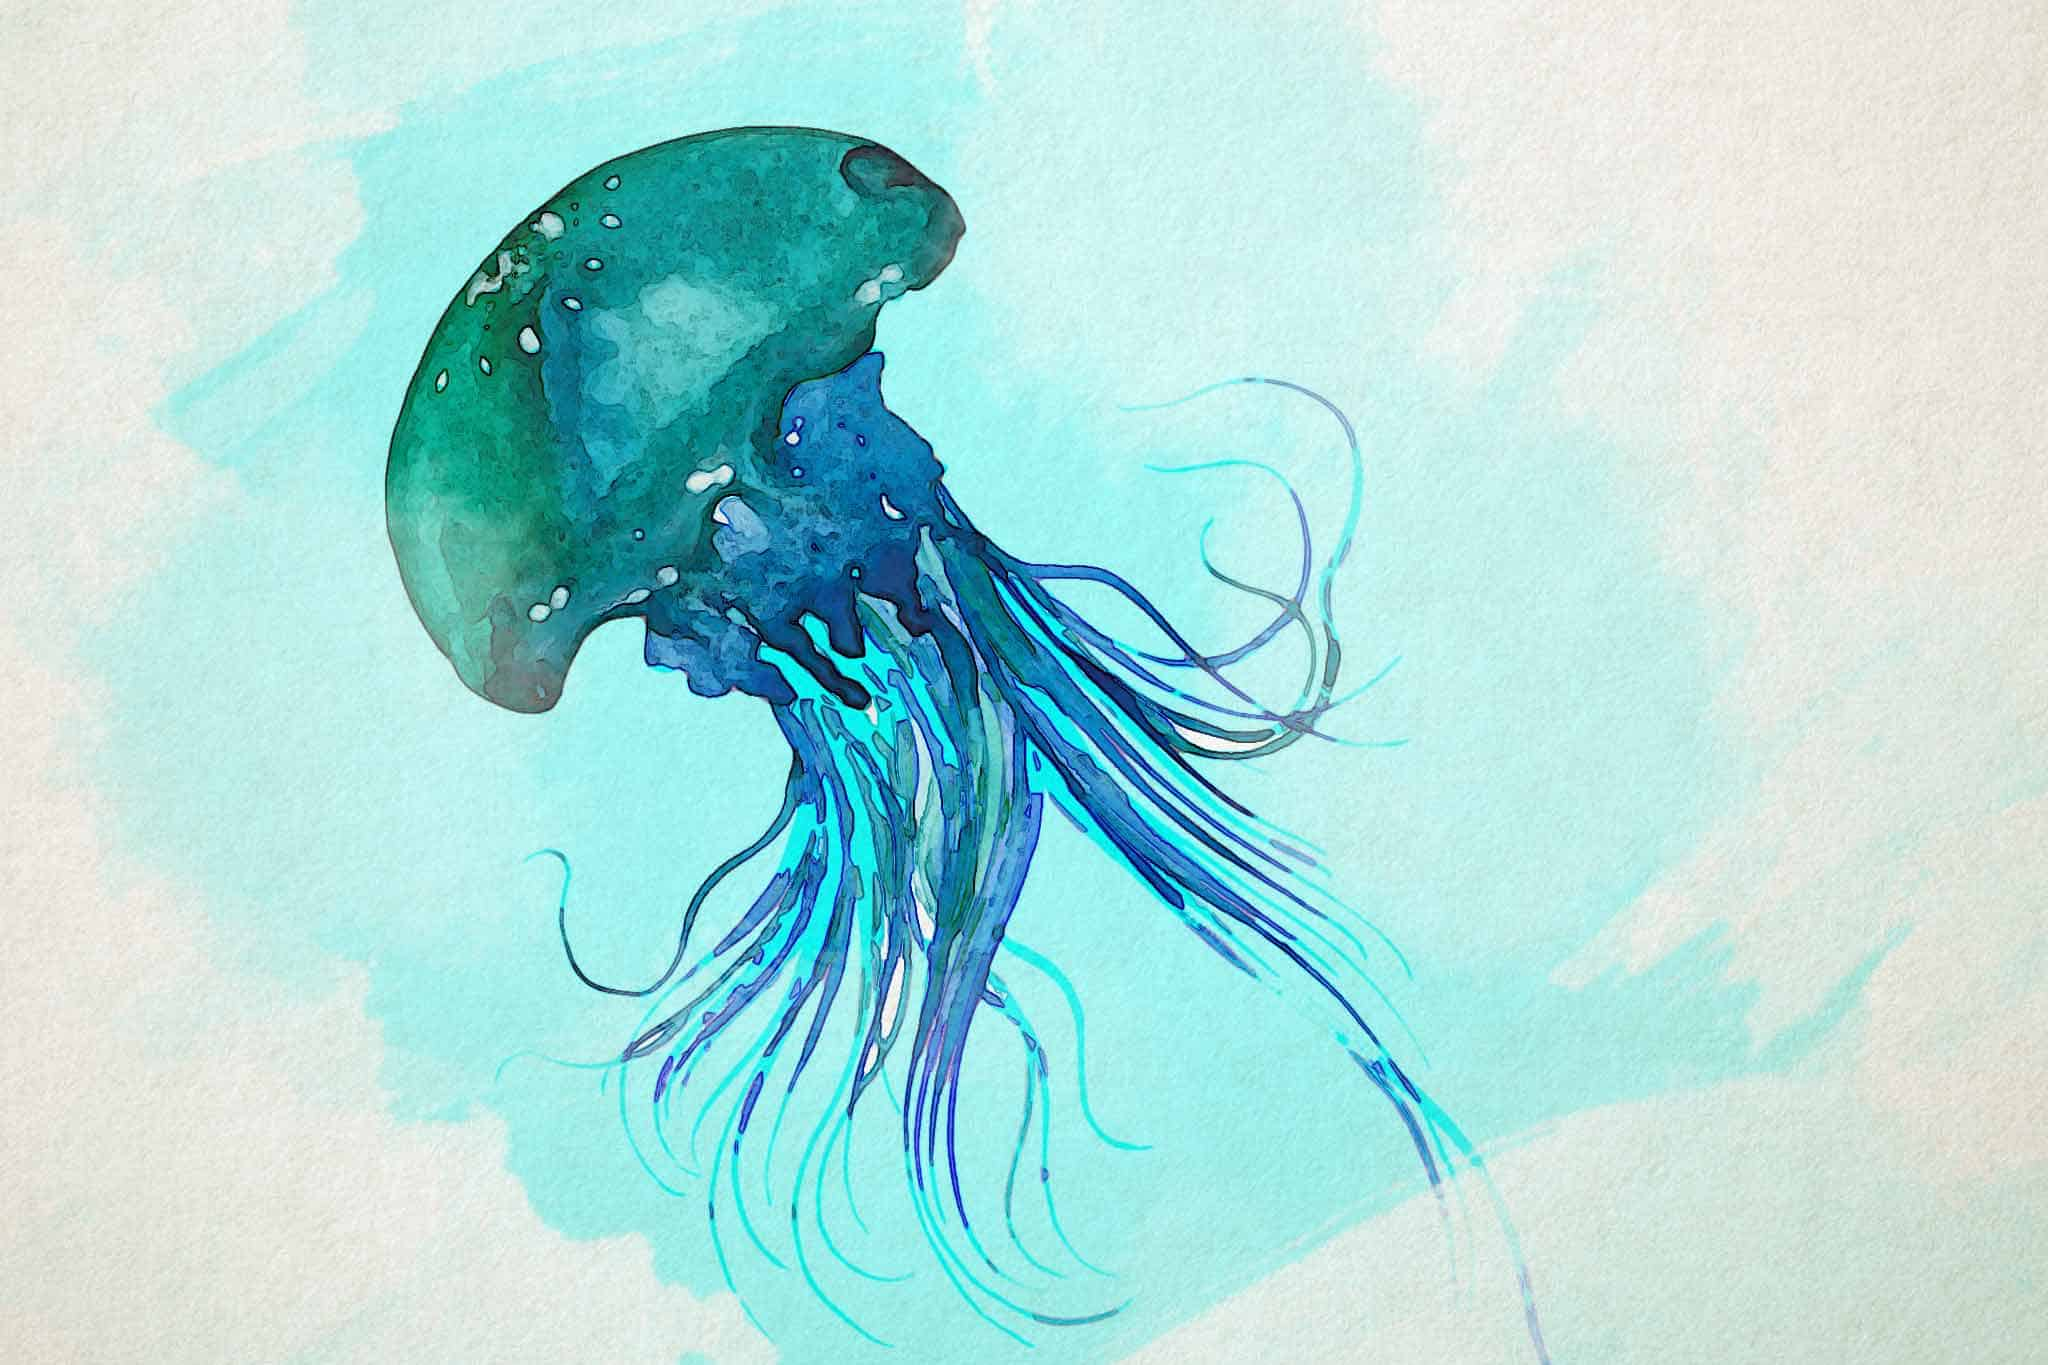 jellyfish green blue